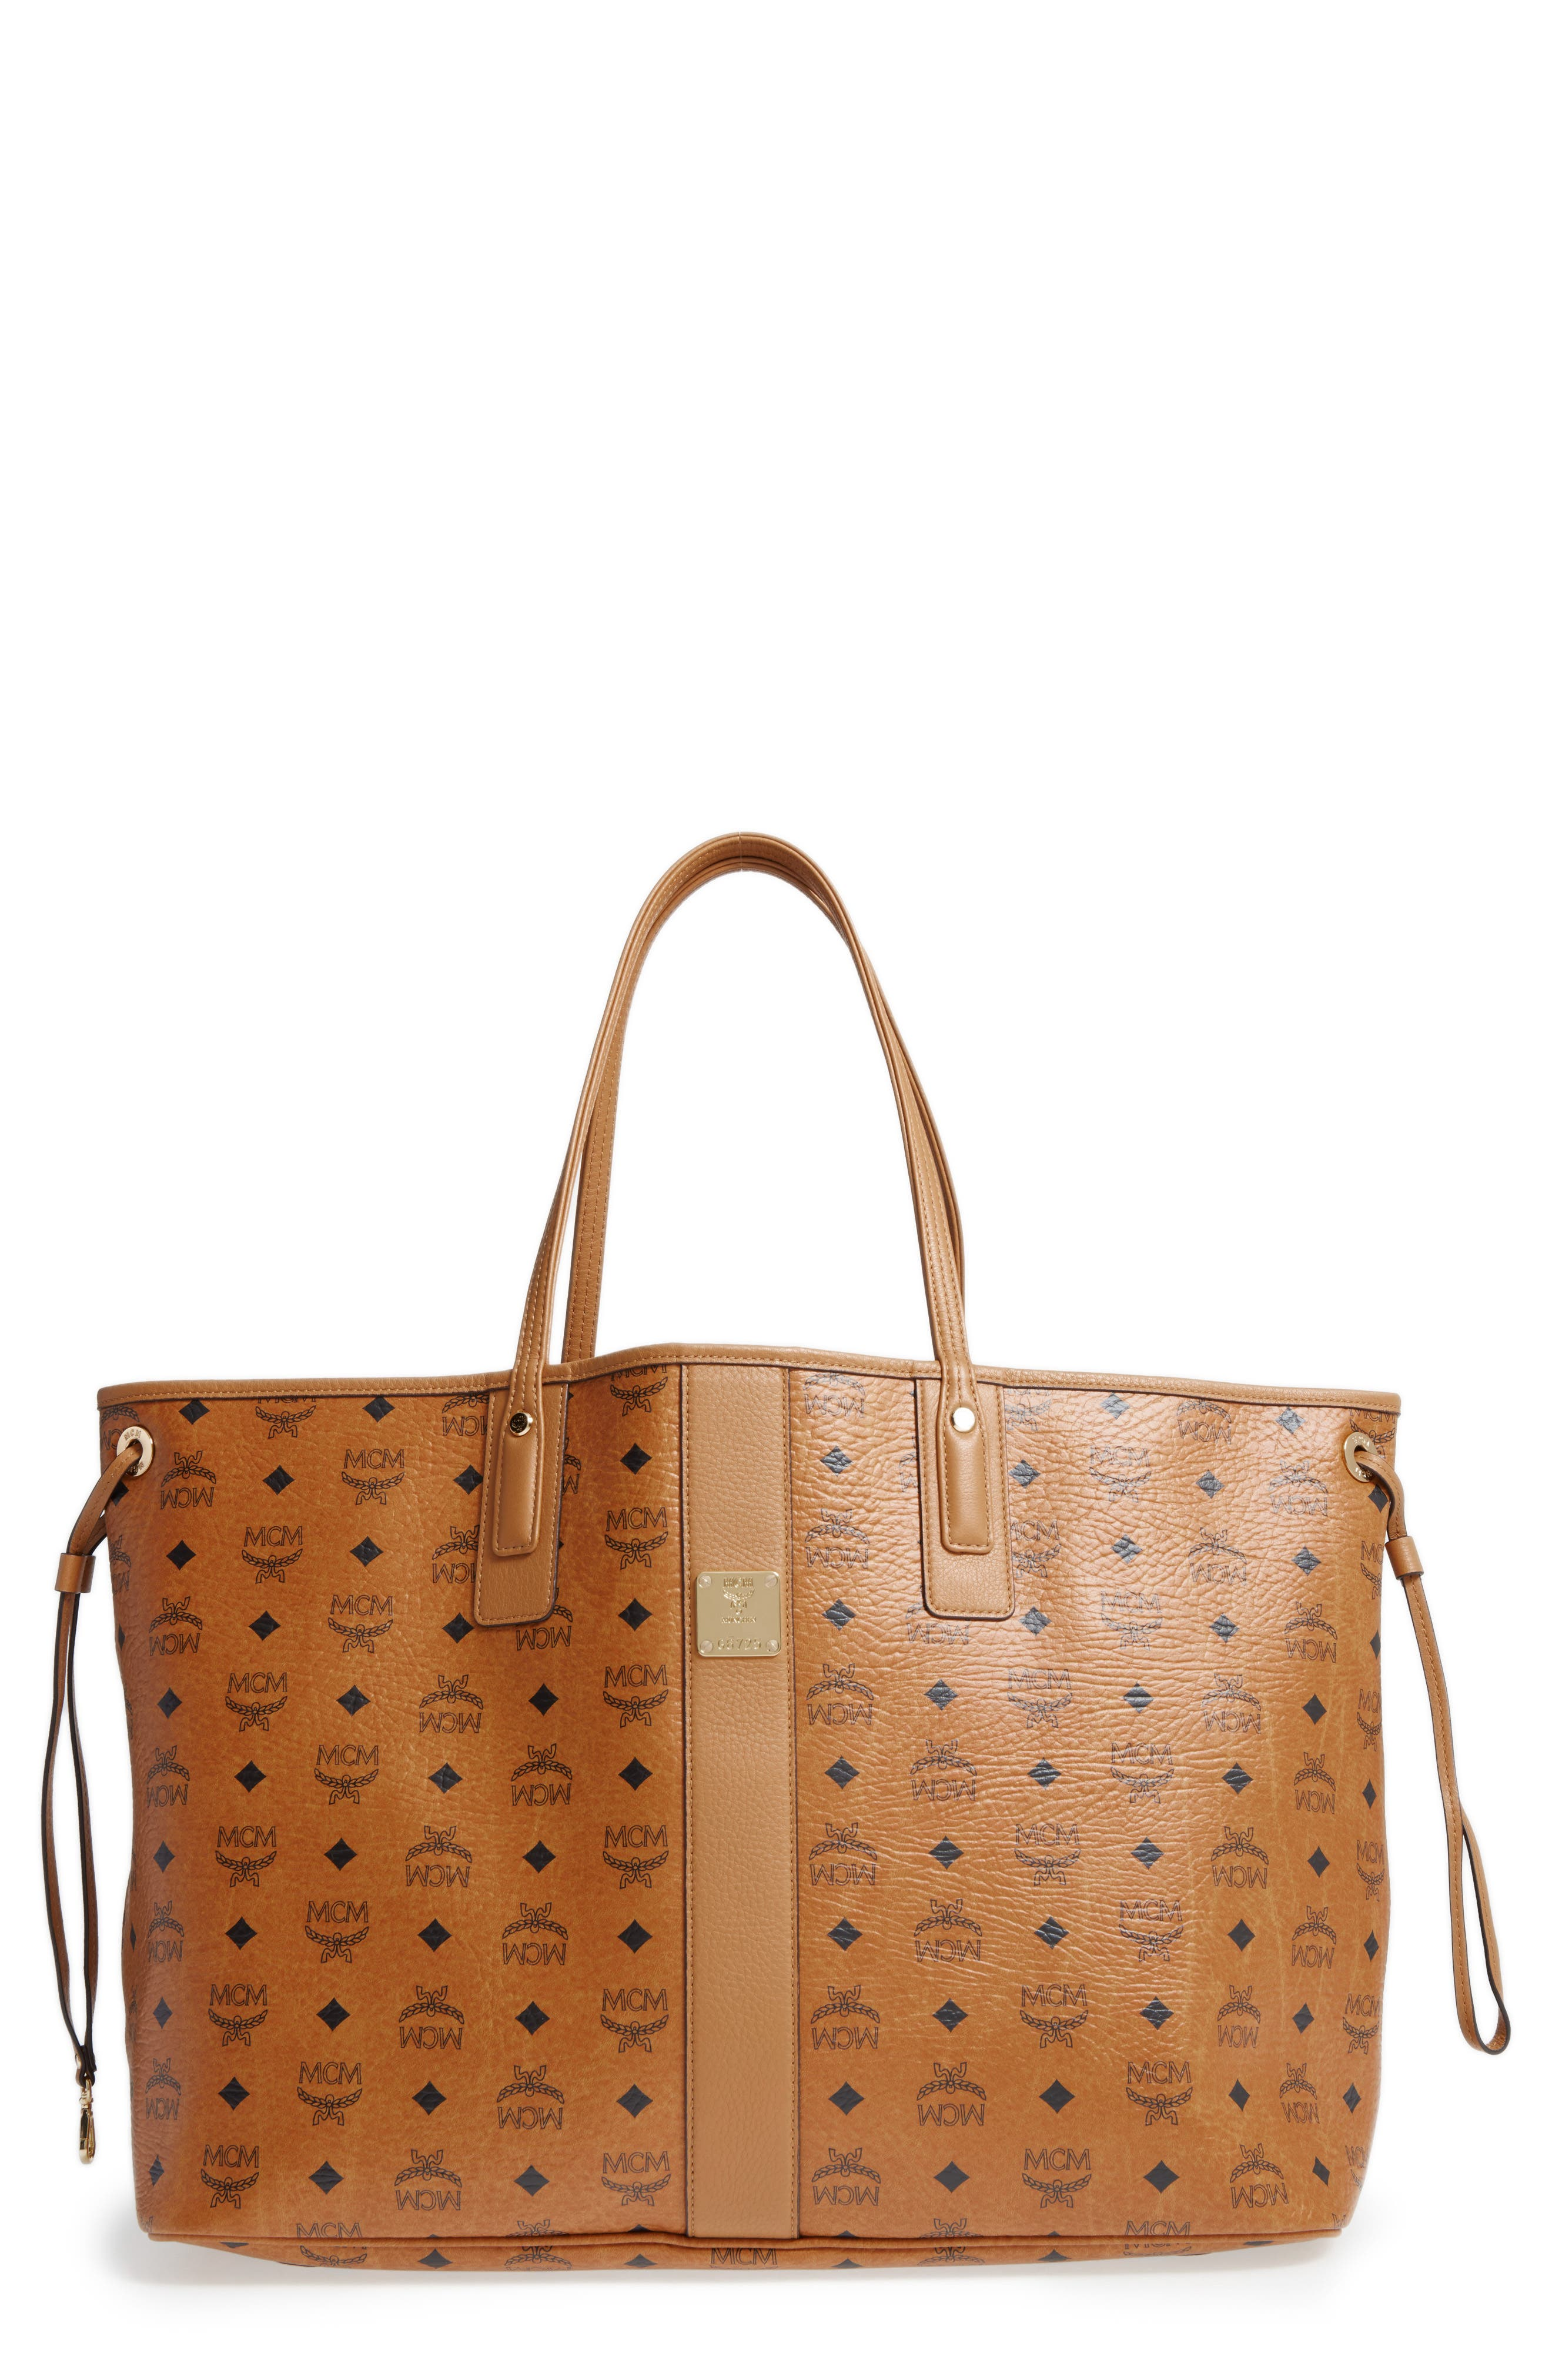 mcm u0027large lizu0027 reversible shopper - Large Tote Bags